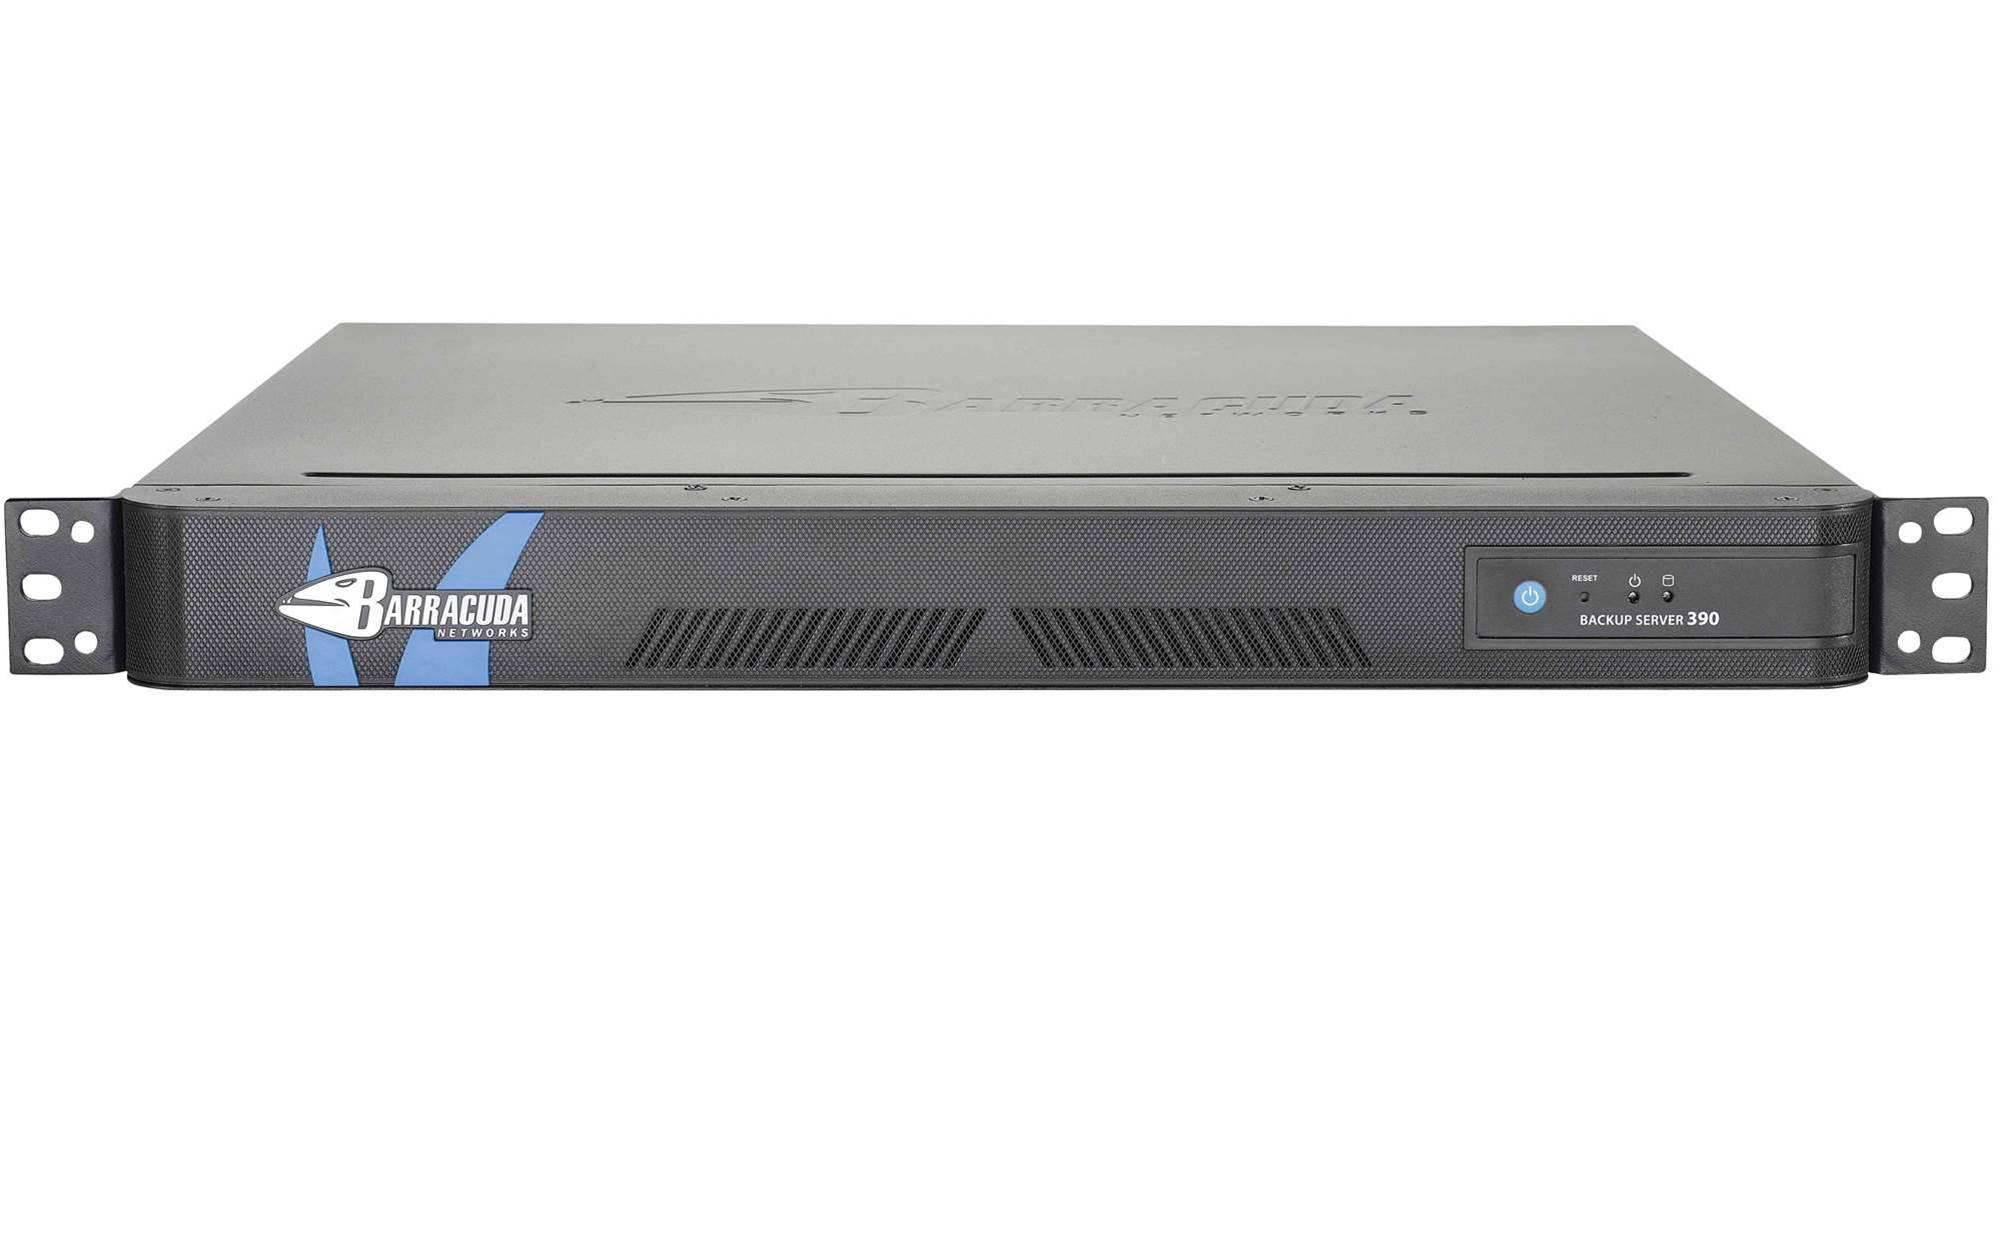 Barracuda Backup Server 390